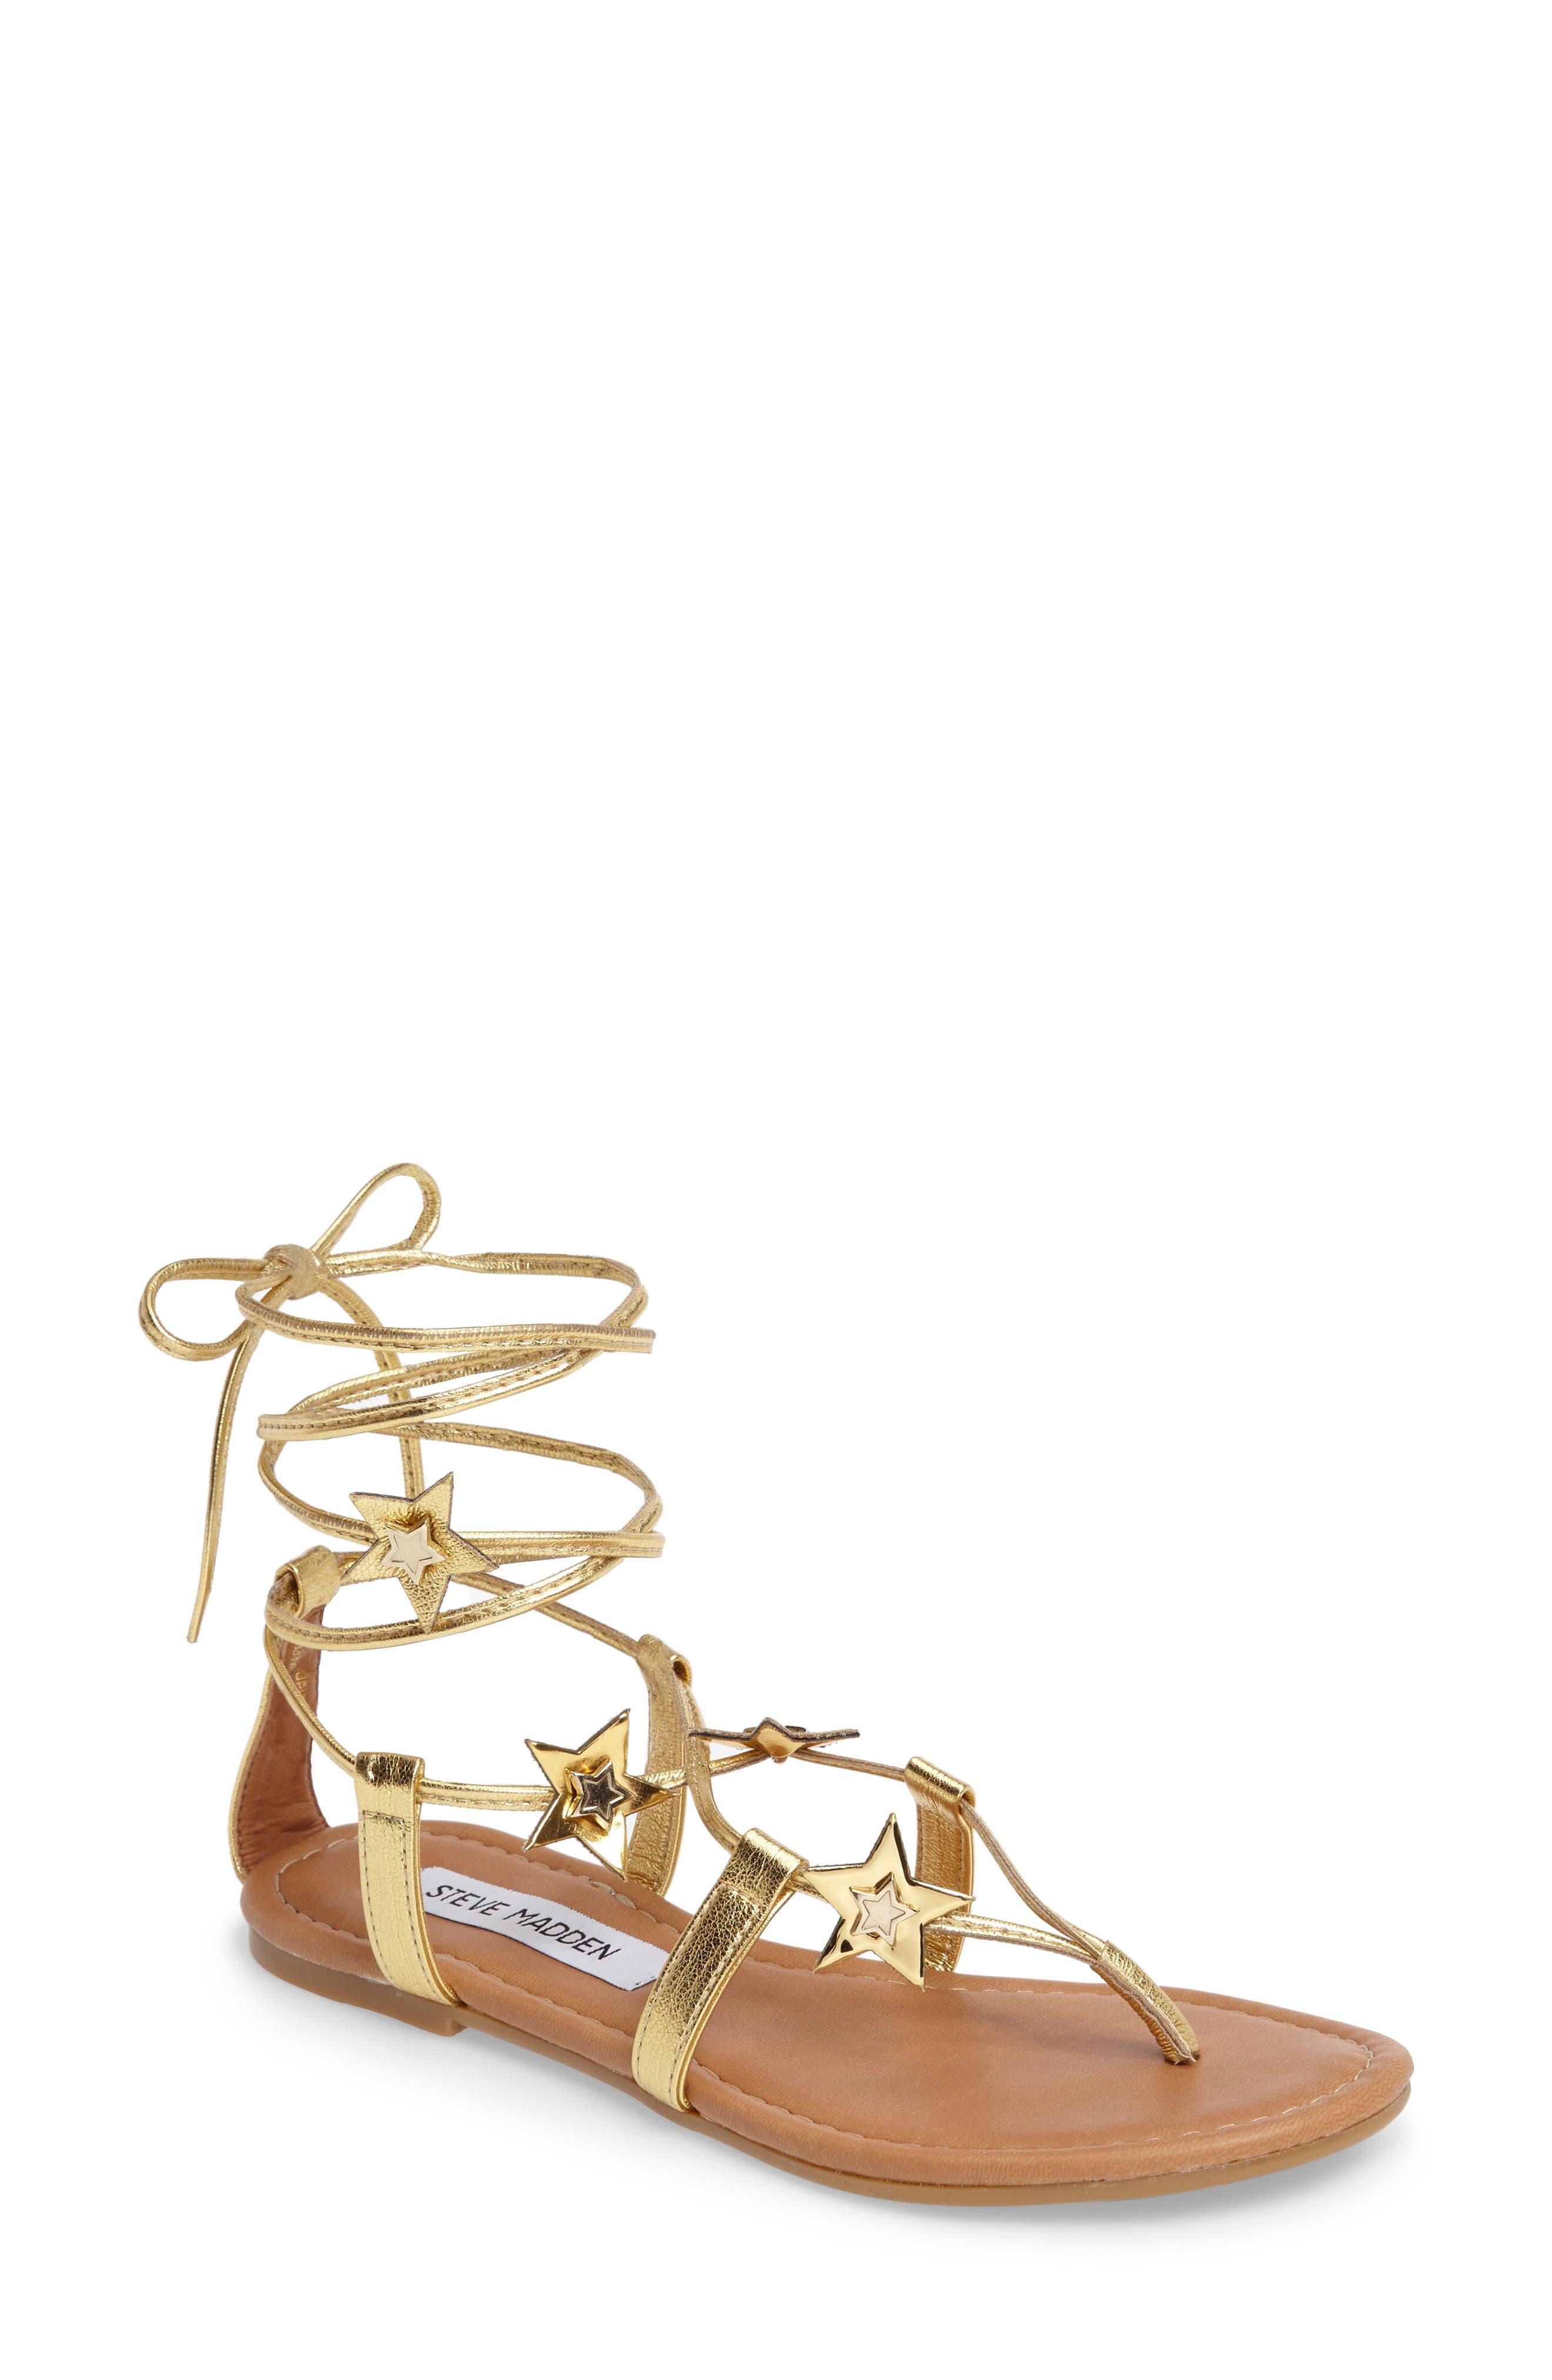 Alternate Image 1 Selected - Steve Madden Jupiter Lace Up Sandal (Women)